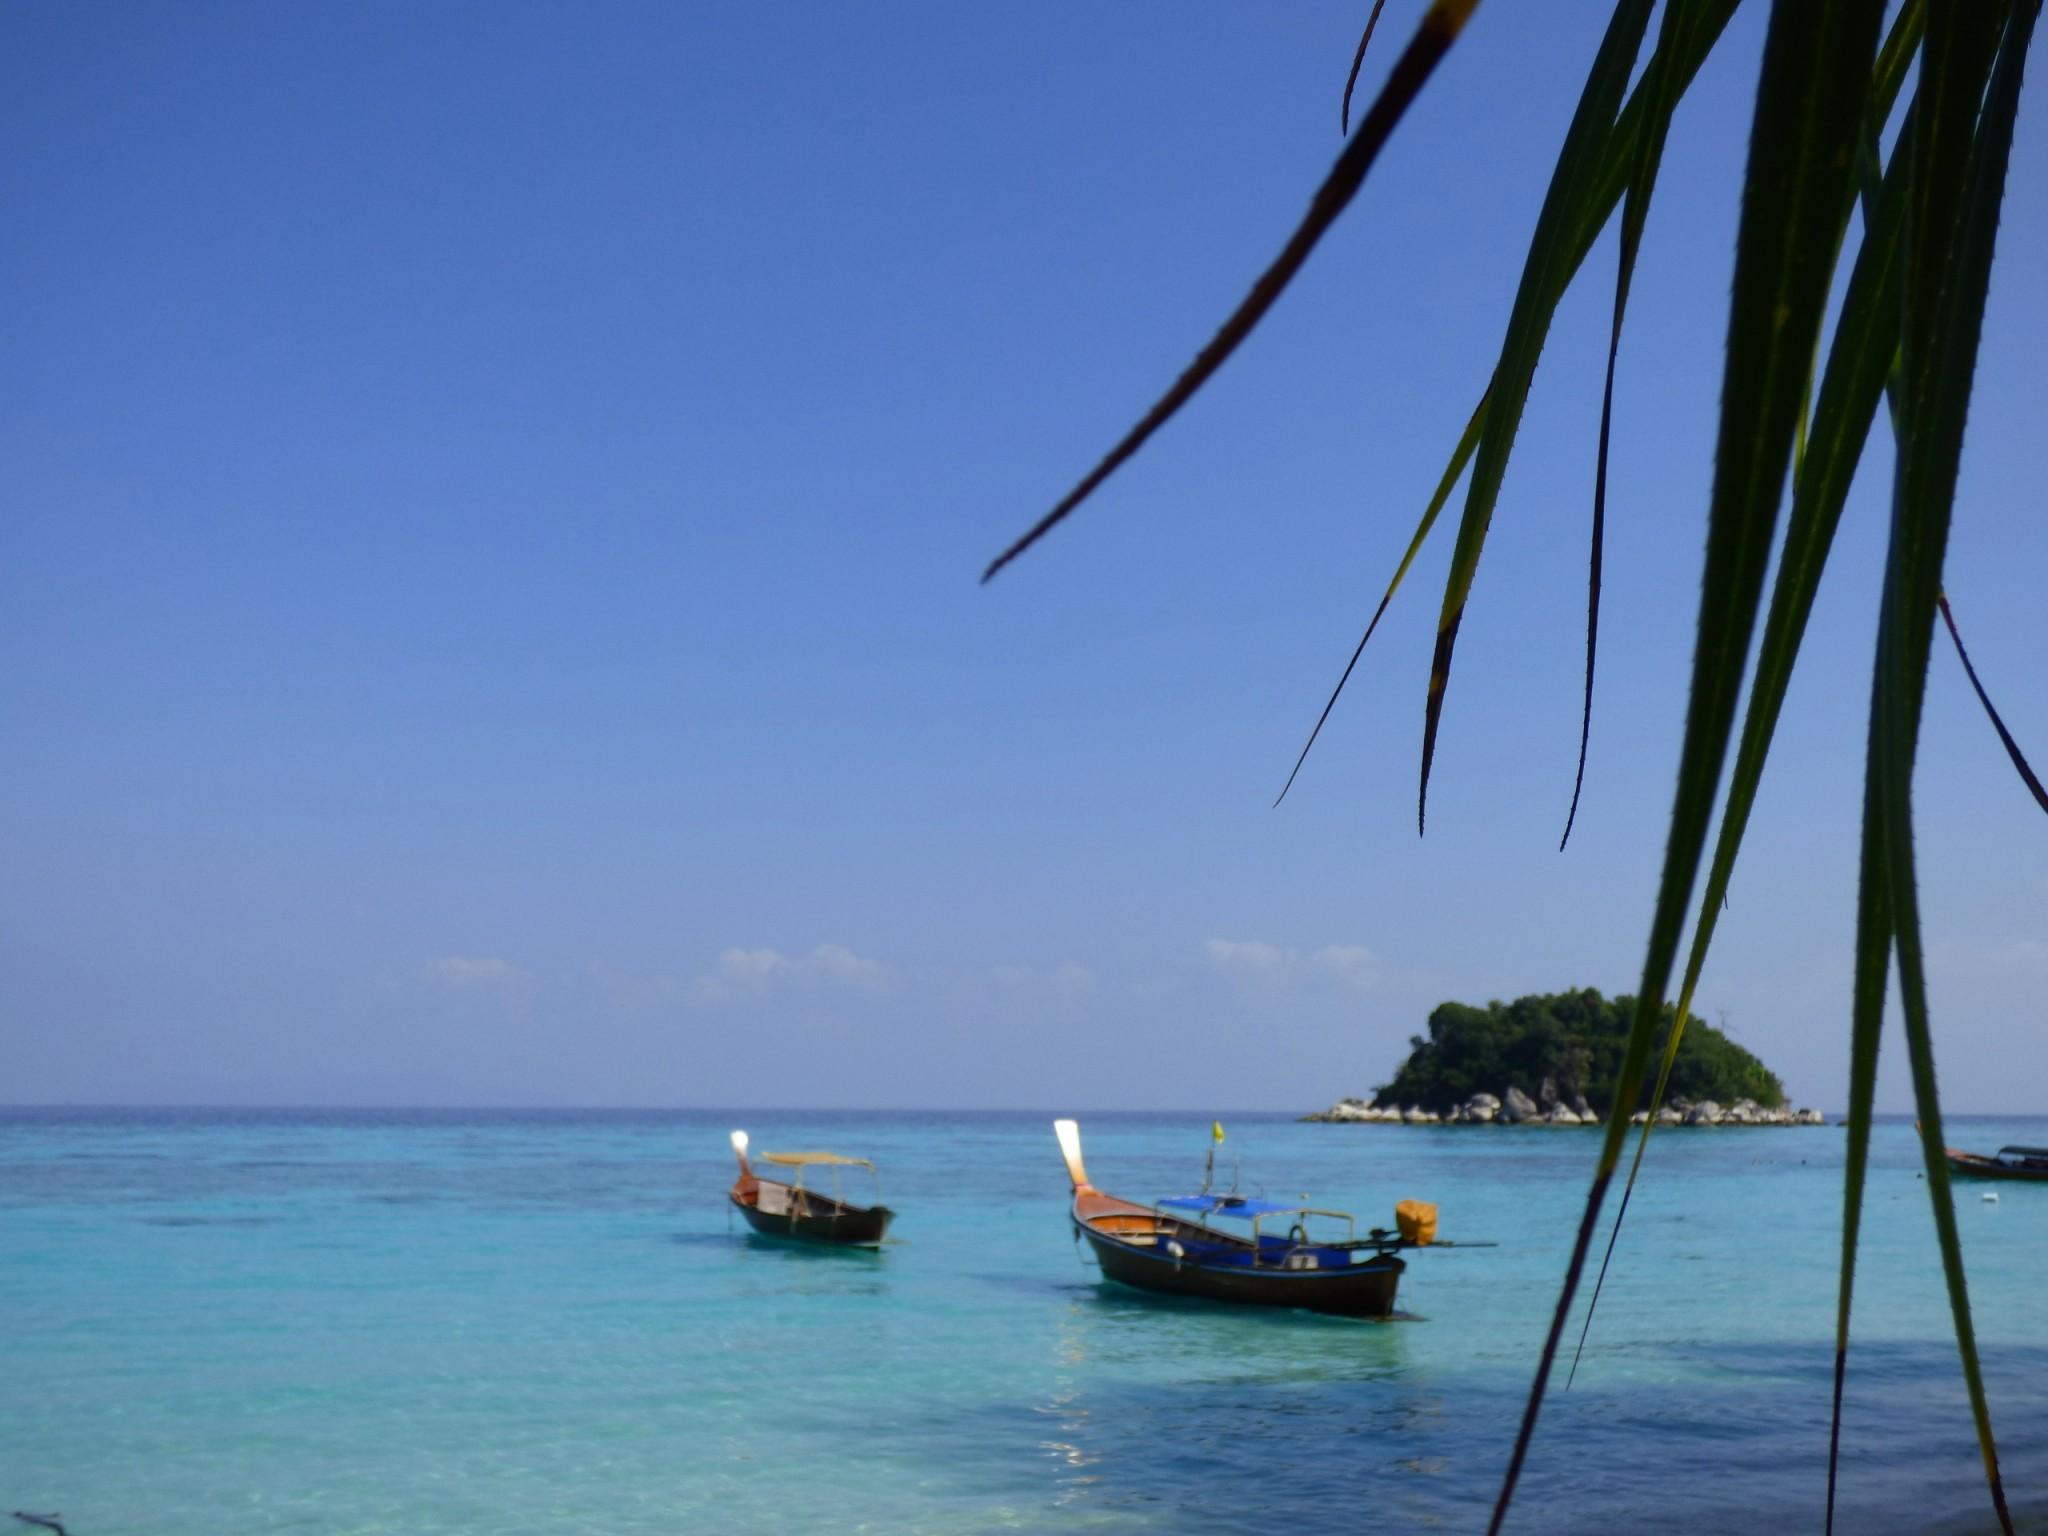 Surise Beach, Koh Lipe